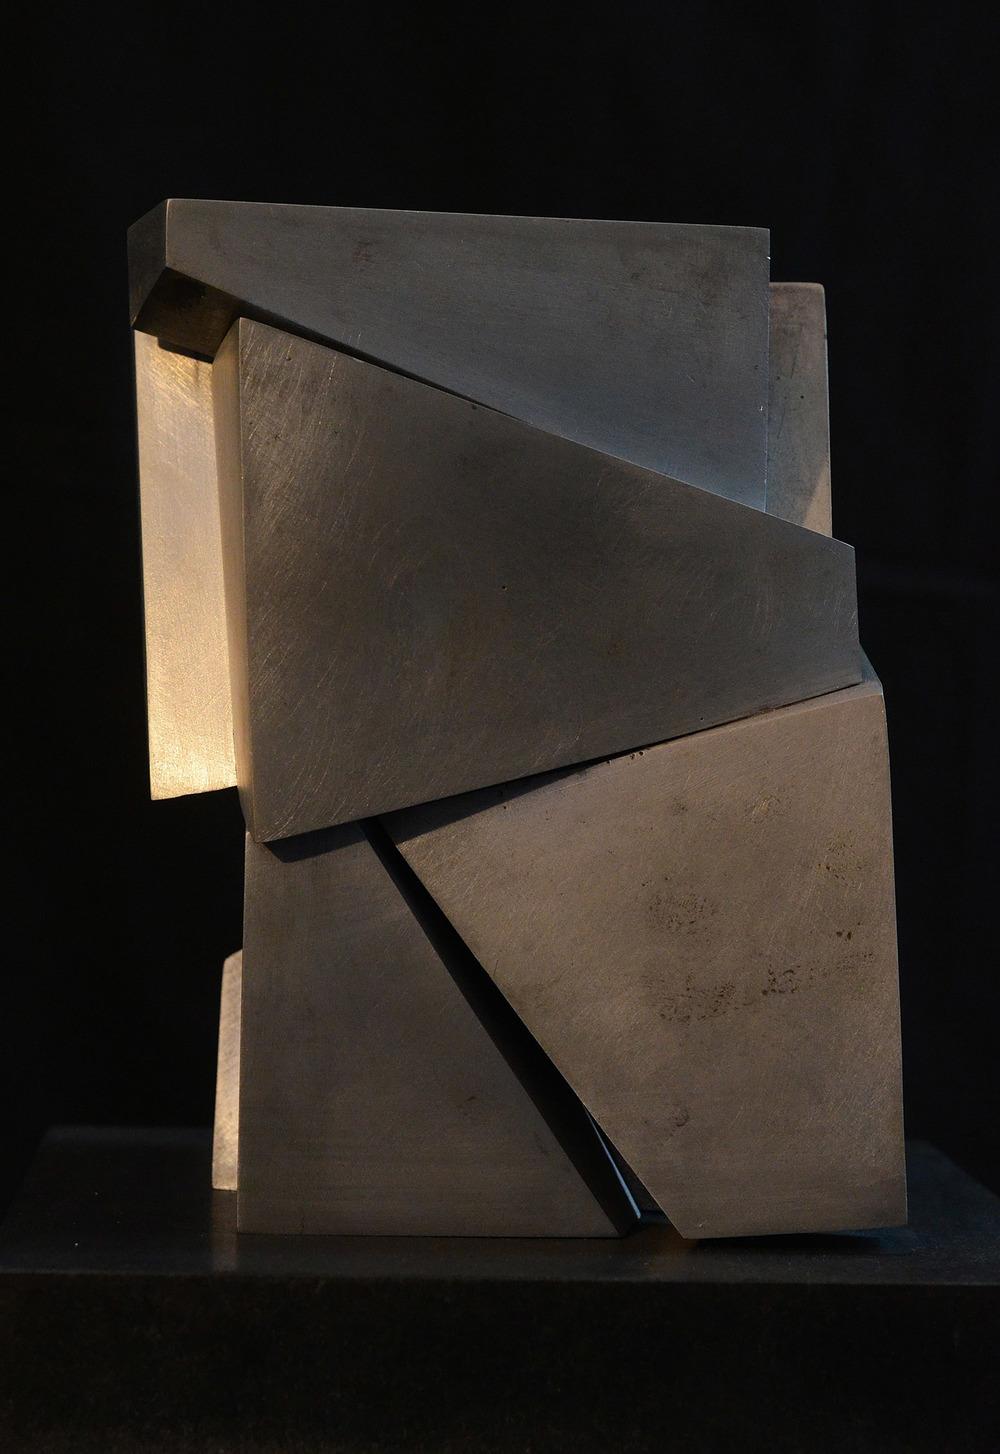 segmented-prism-102.jpg